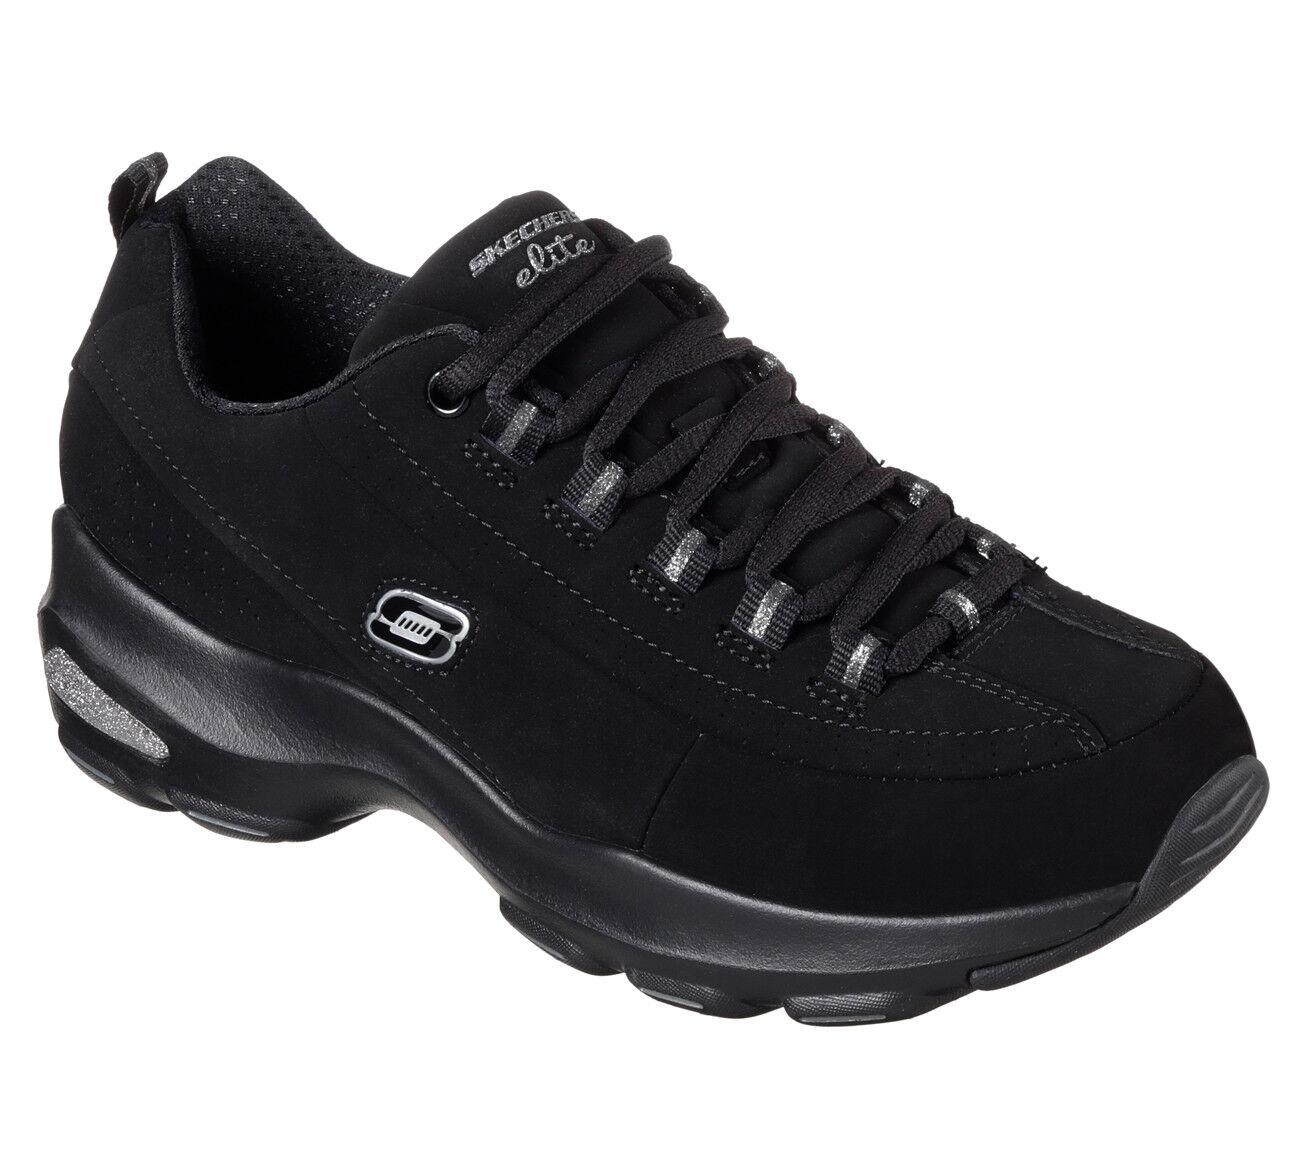 NUOVO Skechers sneakers da donna sneakers Skechers D'Lite Ultra-Reverie Nero bb1068